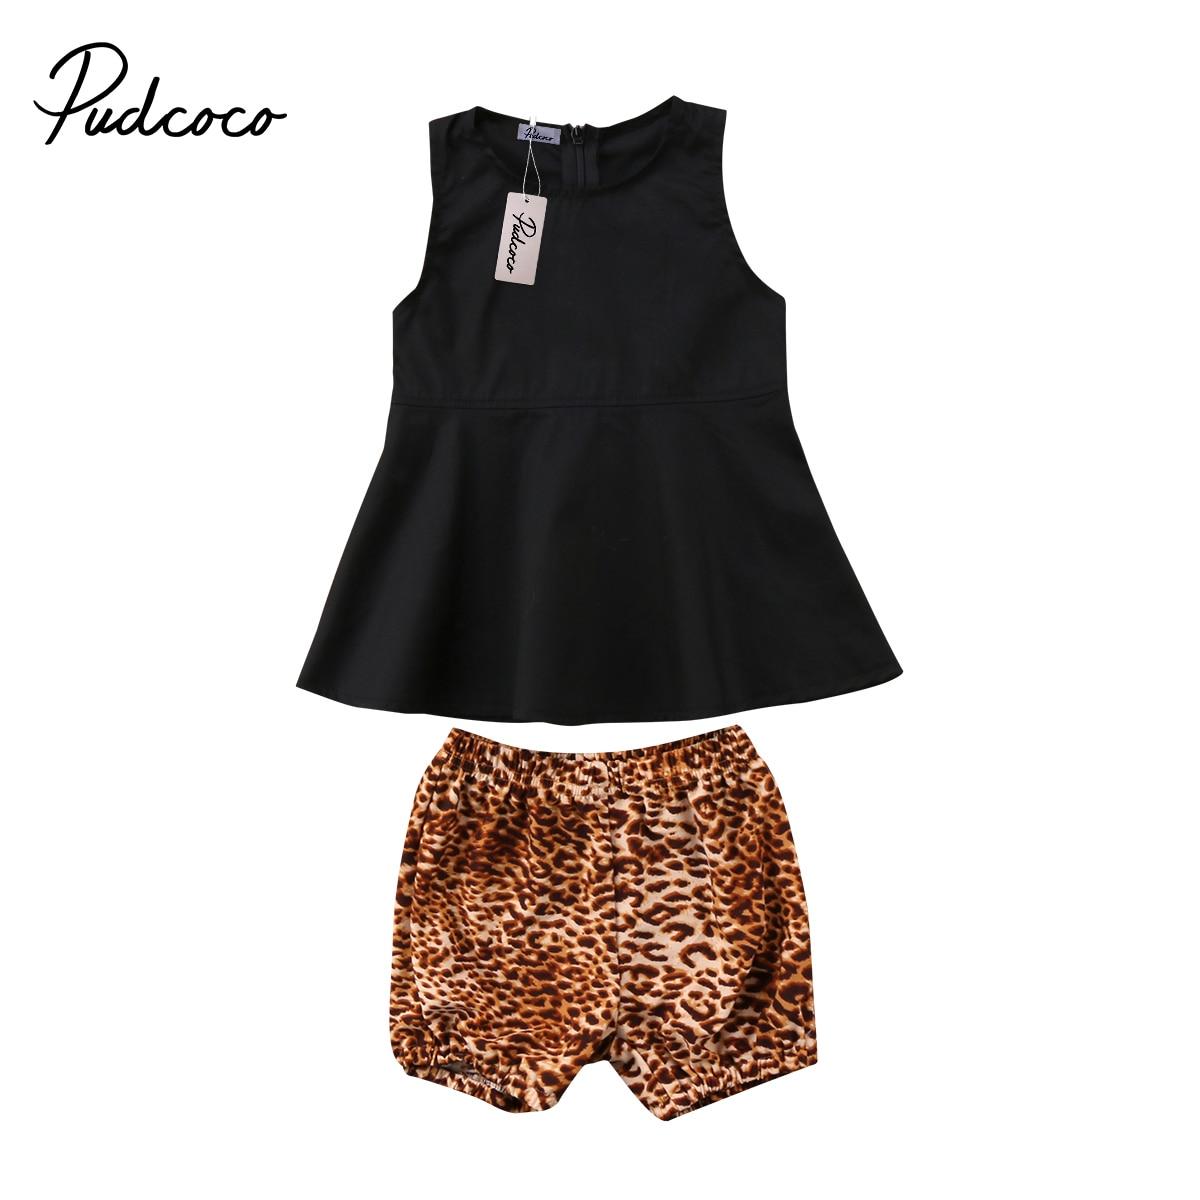 Pudcoco 2pcs Newborn Kid Baby Girls Clothes Summer Tops Dress Shorts Pants Outfit Set 0-24Months Helen115